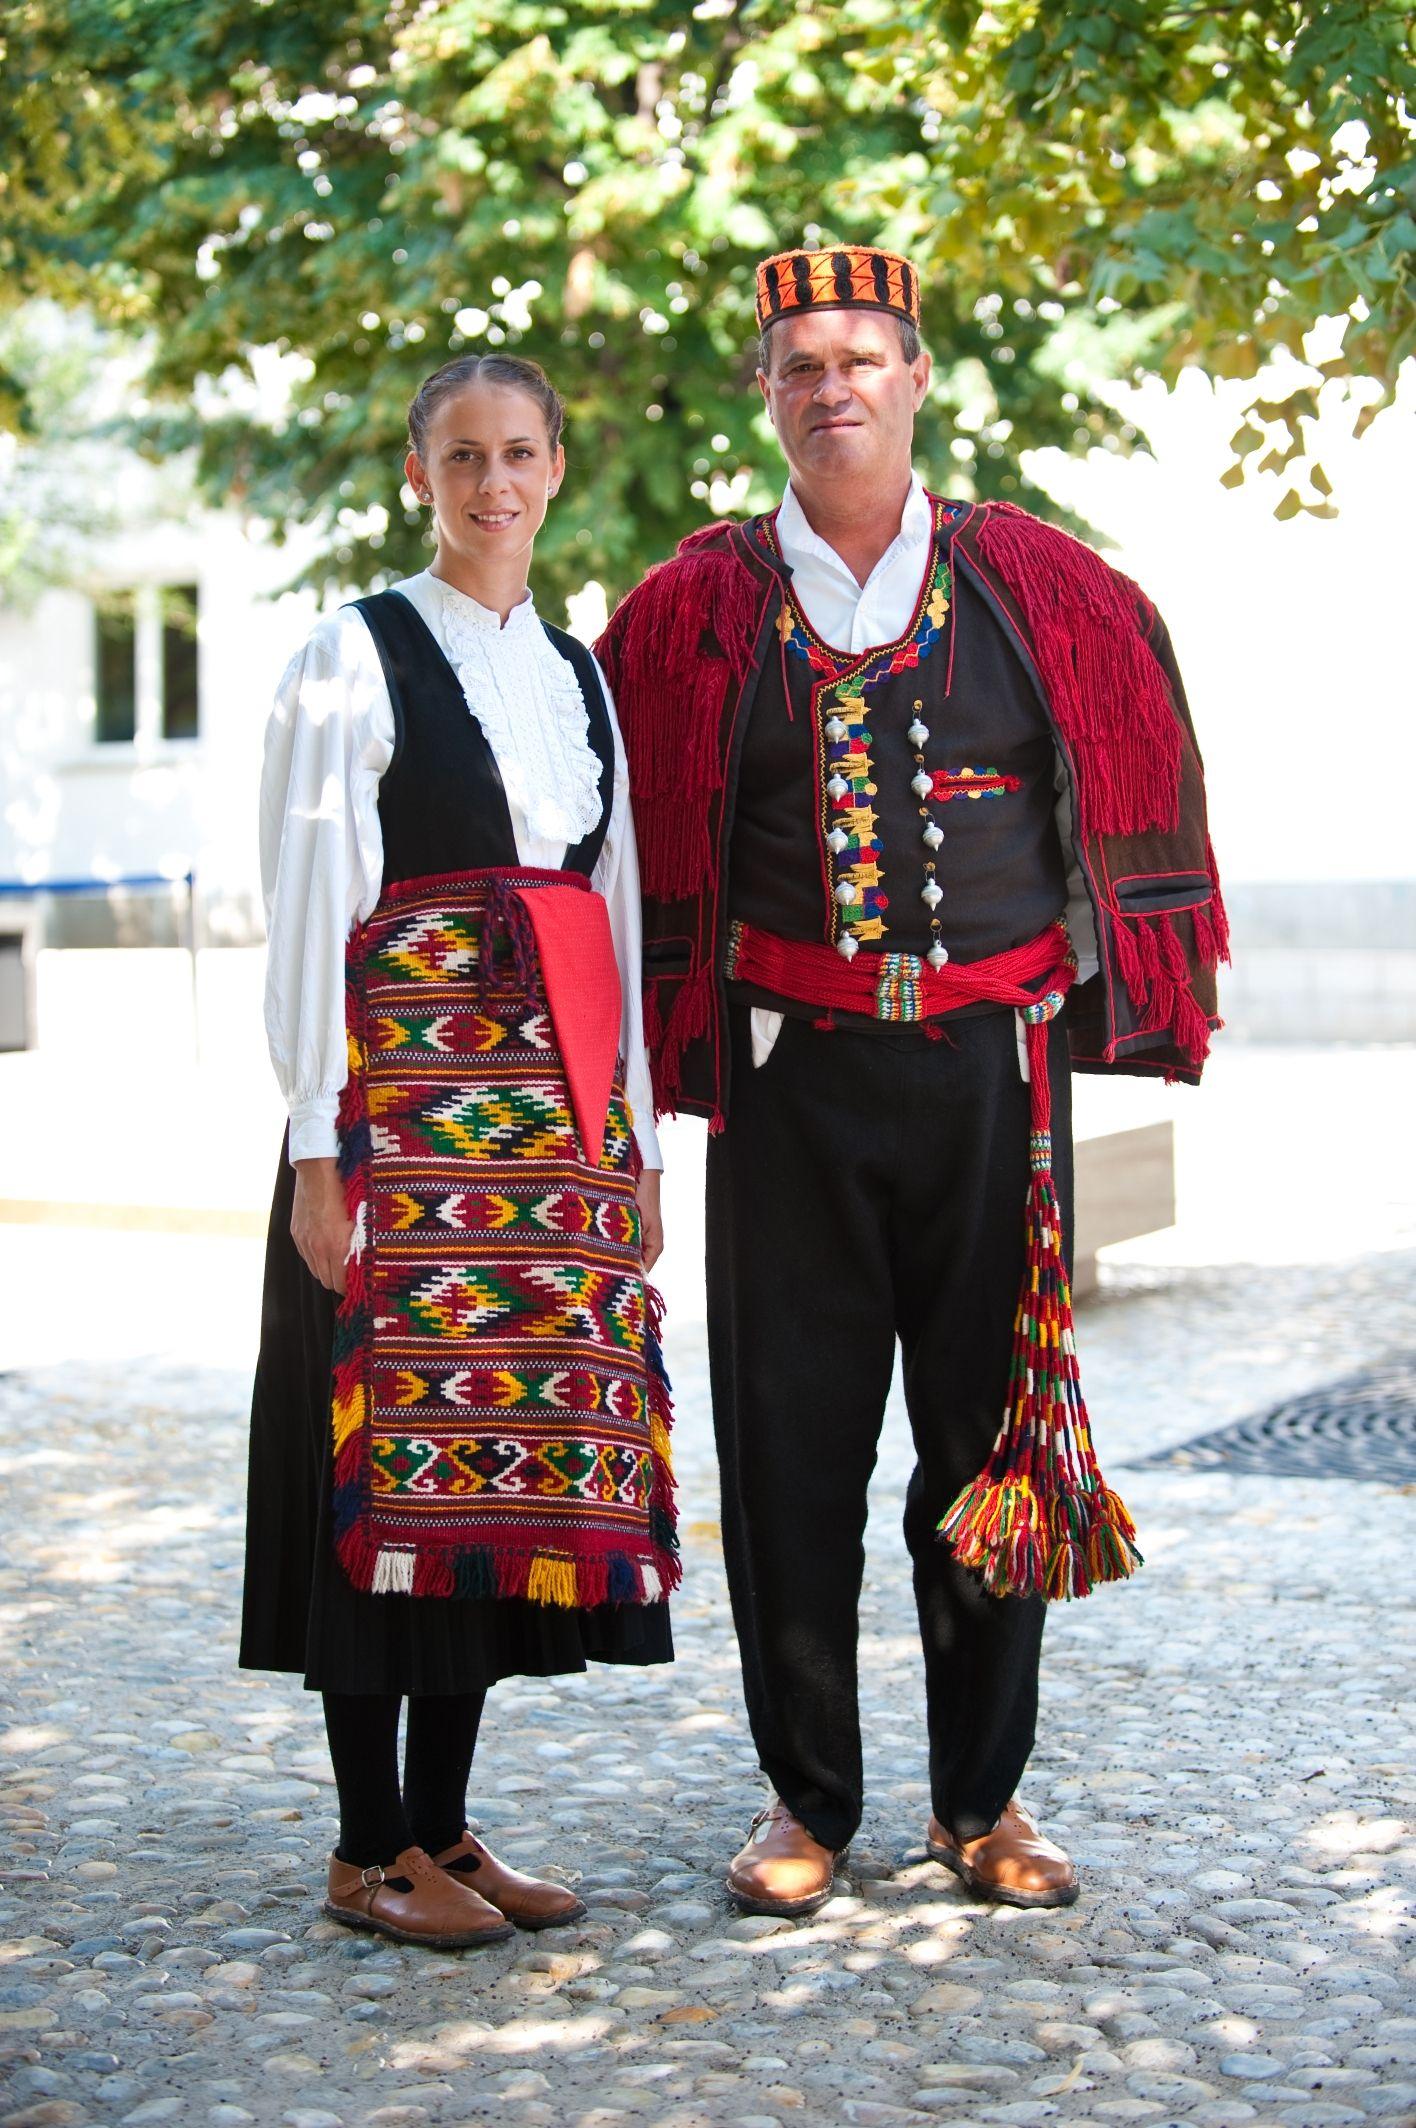 besondere kleidung in polen | folk clothing, traditional